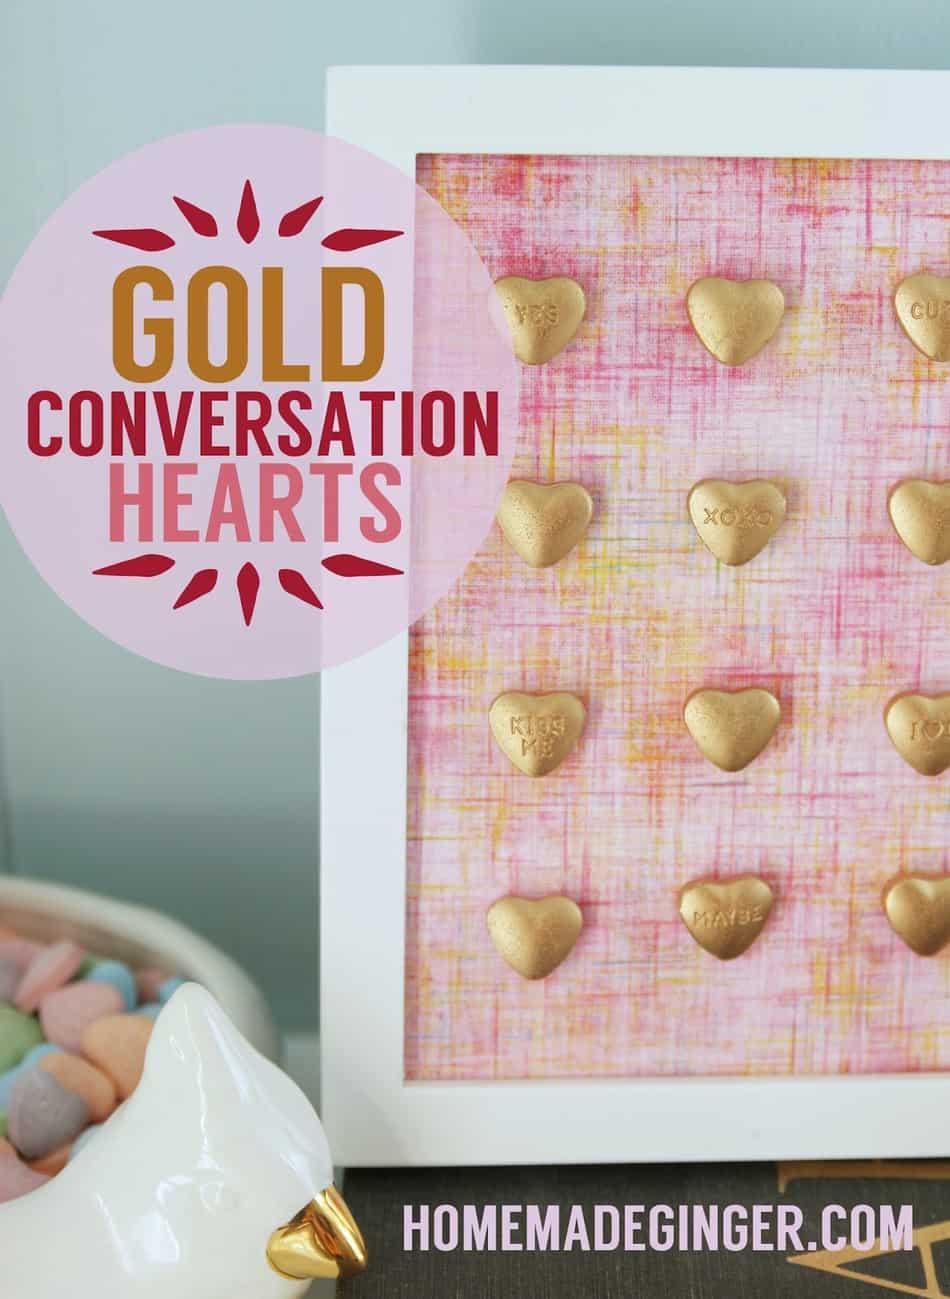 Gold Conversation Hearts